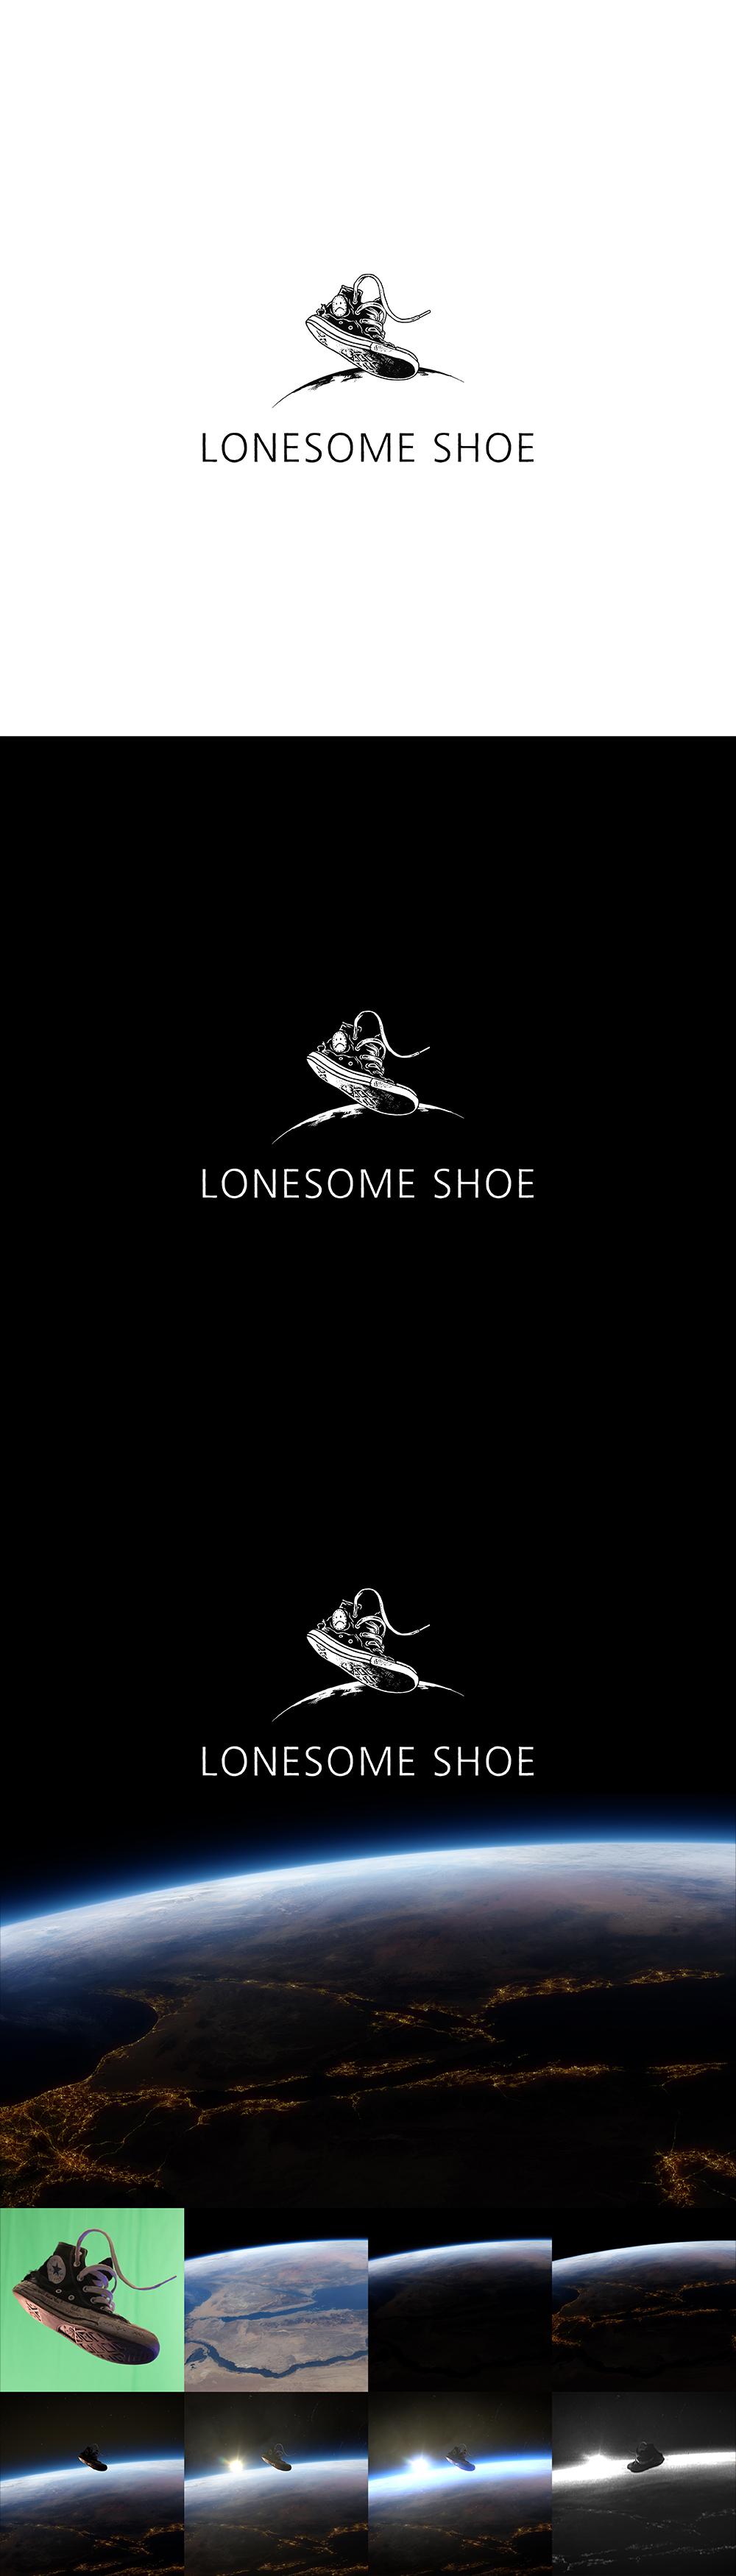 Lonesome Shoe